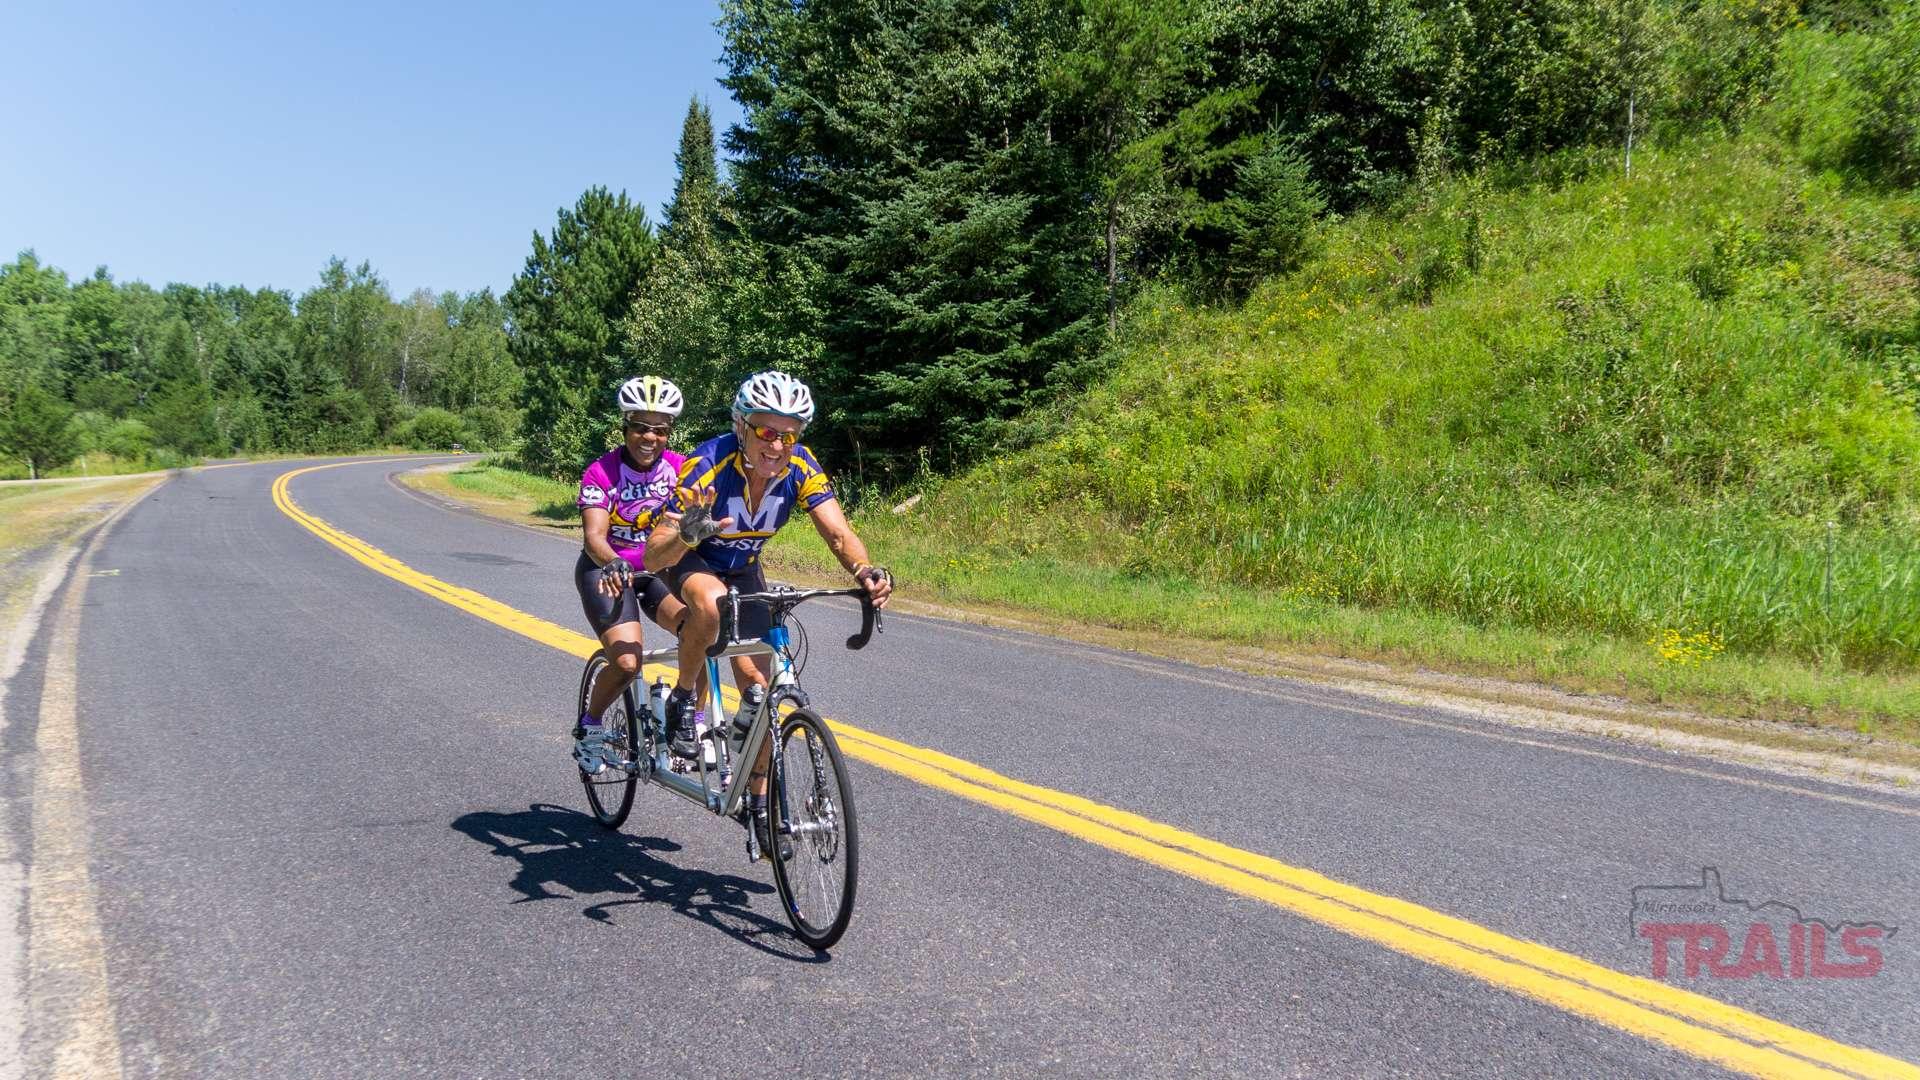 Find your favorite Minnesota Bike Ride with Minnesota Trails Magazine